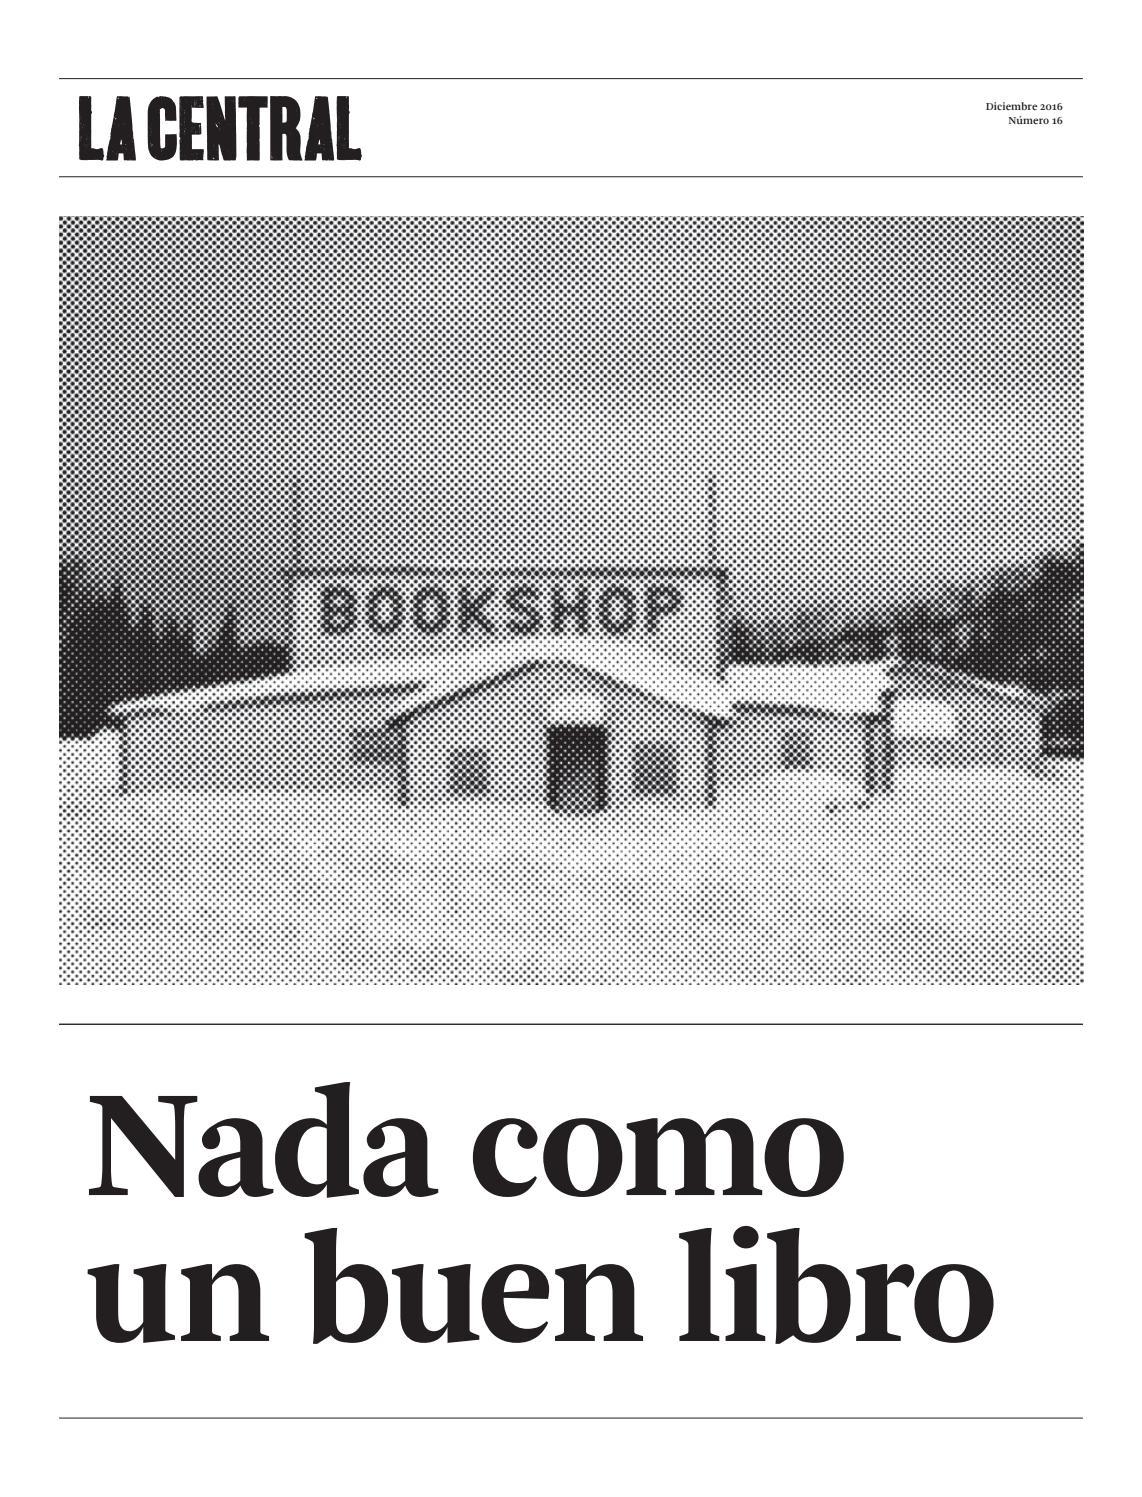 Diario La Central n.16 Diciembre 2016 by webmaster LaCentral - issuu